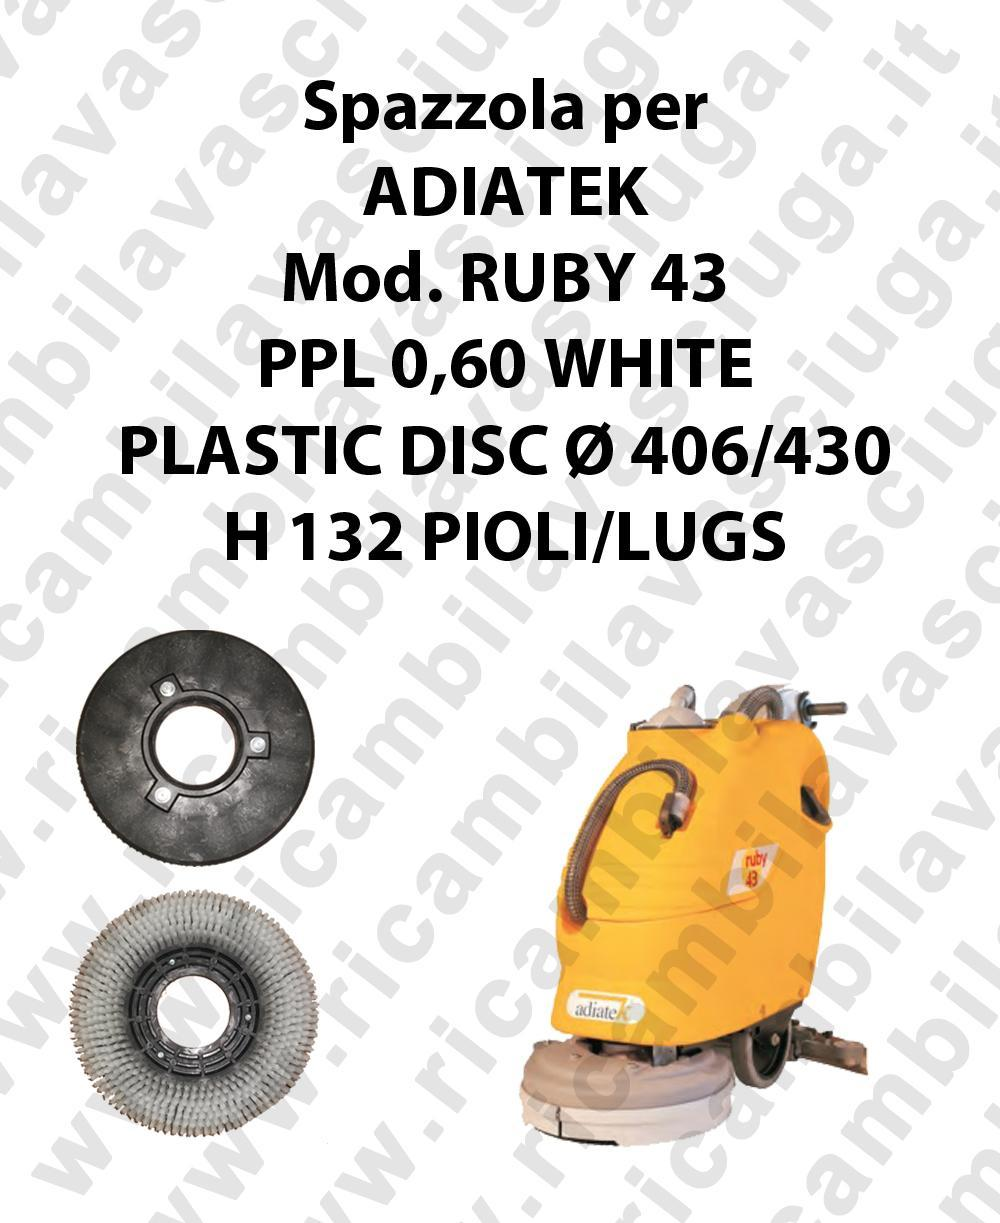 CEPILLO DE LAVADO PPL 0,60 WHITE para fregadora ADIATEK modelo RUBY 43